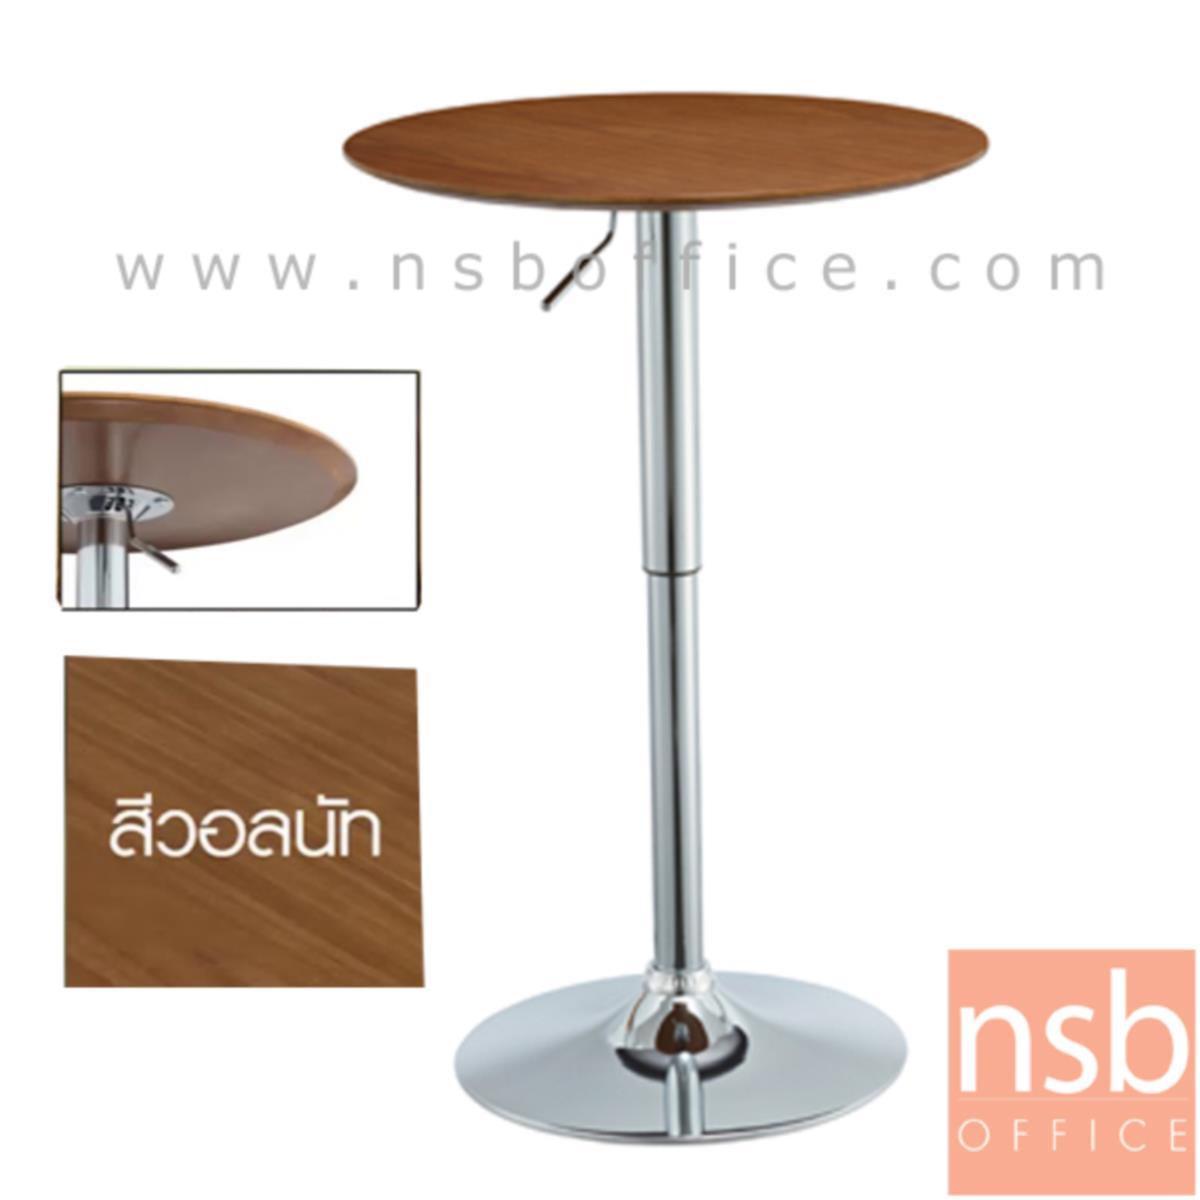 A09A121:โต๊ะบาร์หน้าไม้กลม  รุ่น Kingsmill ขนาด 60Di cm. โช๊คแก๊ส ฐานขาเหล็กชุบโครเมี่ยม